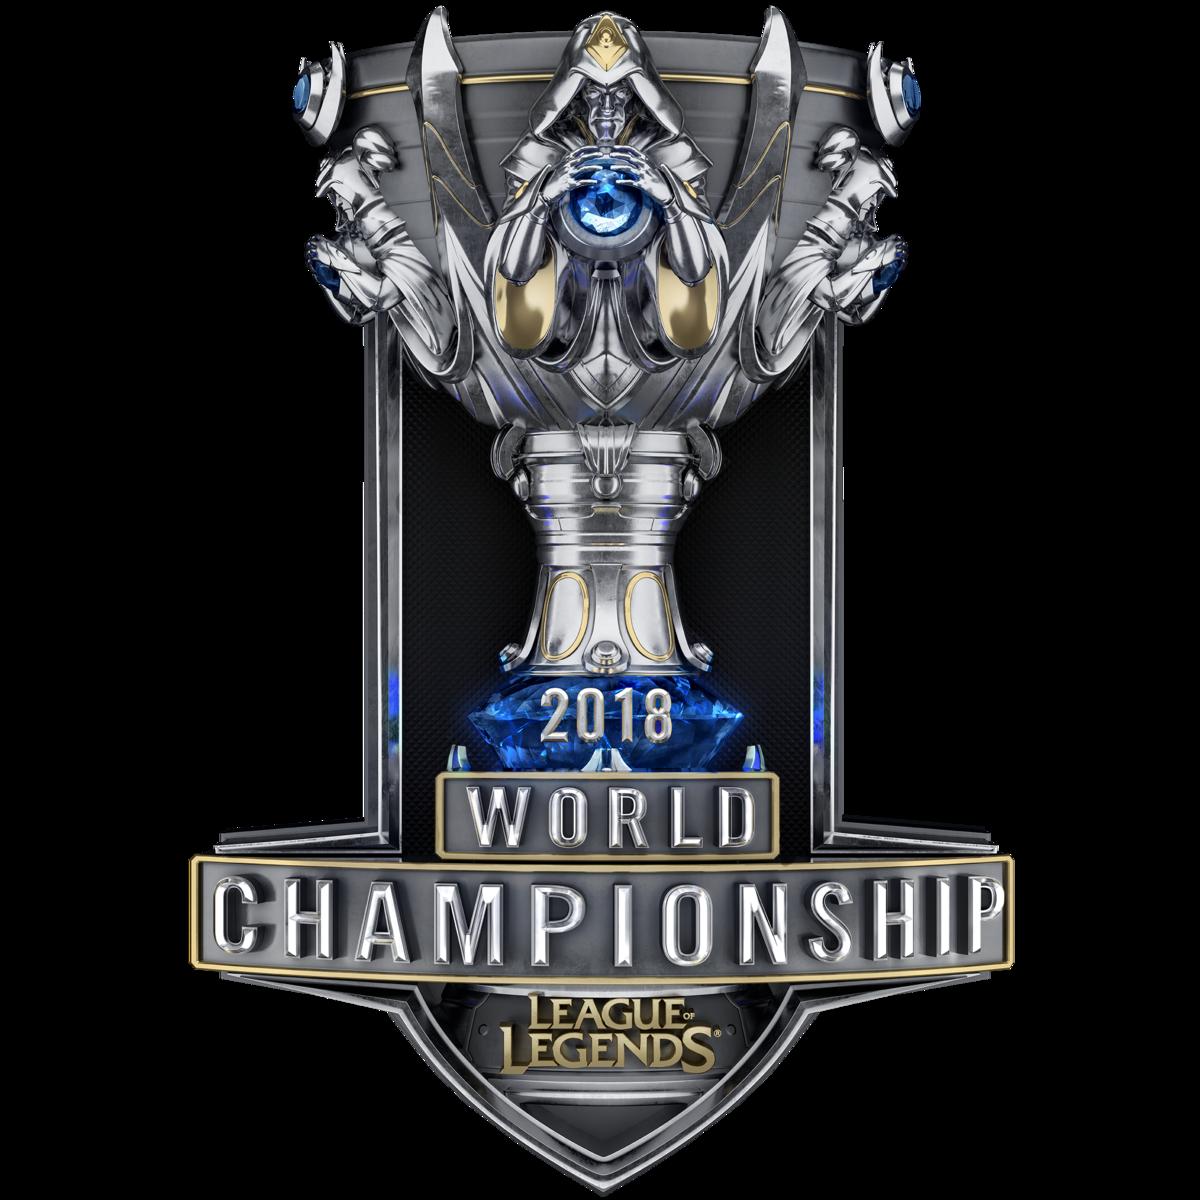 Worlds 2018 - Leaguepedia | League of Legends Esports Wiki